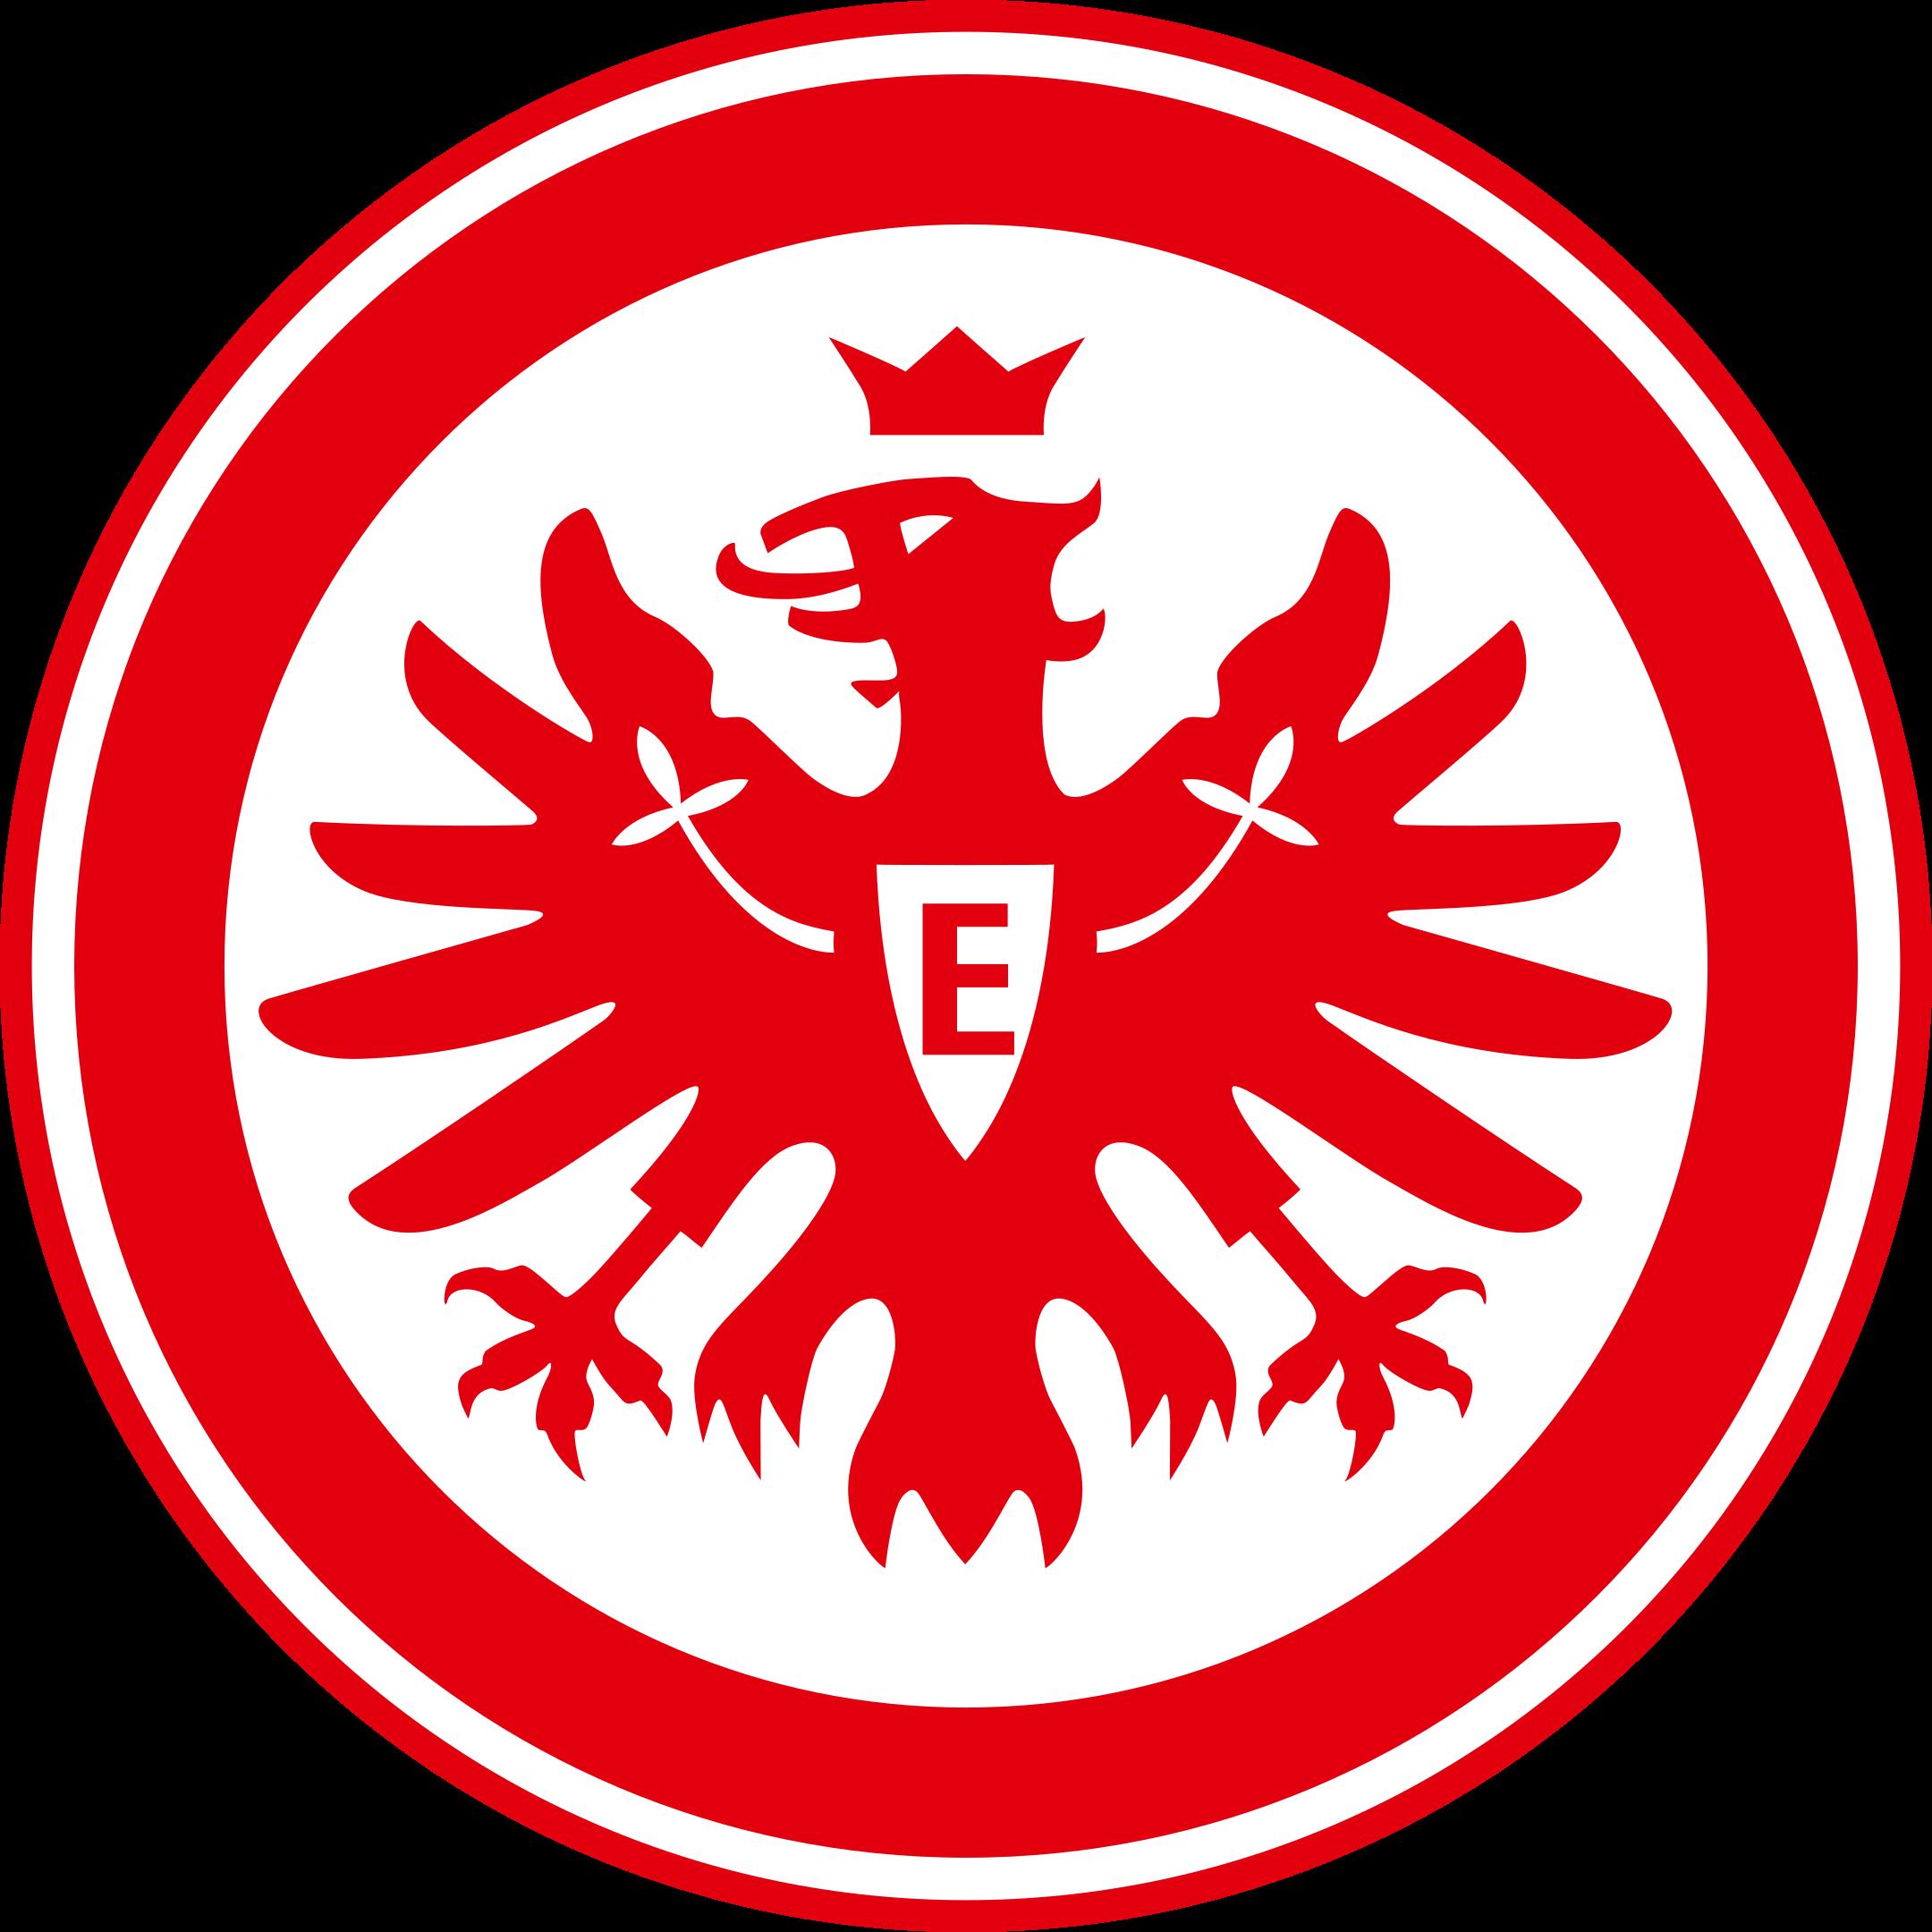 eintracht frankfurt logo 1 - Eintracht Frankfurt Logo